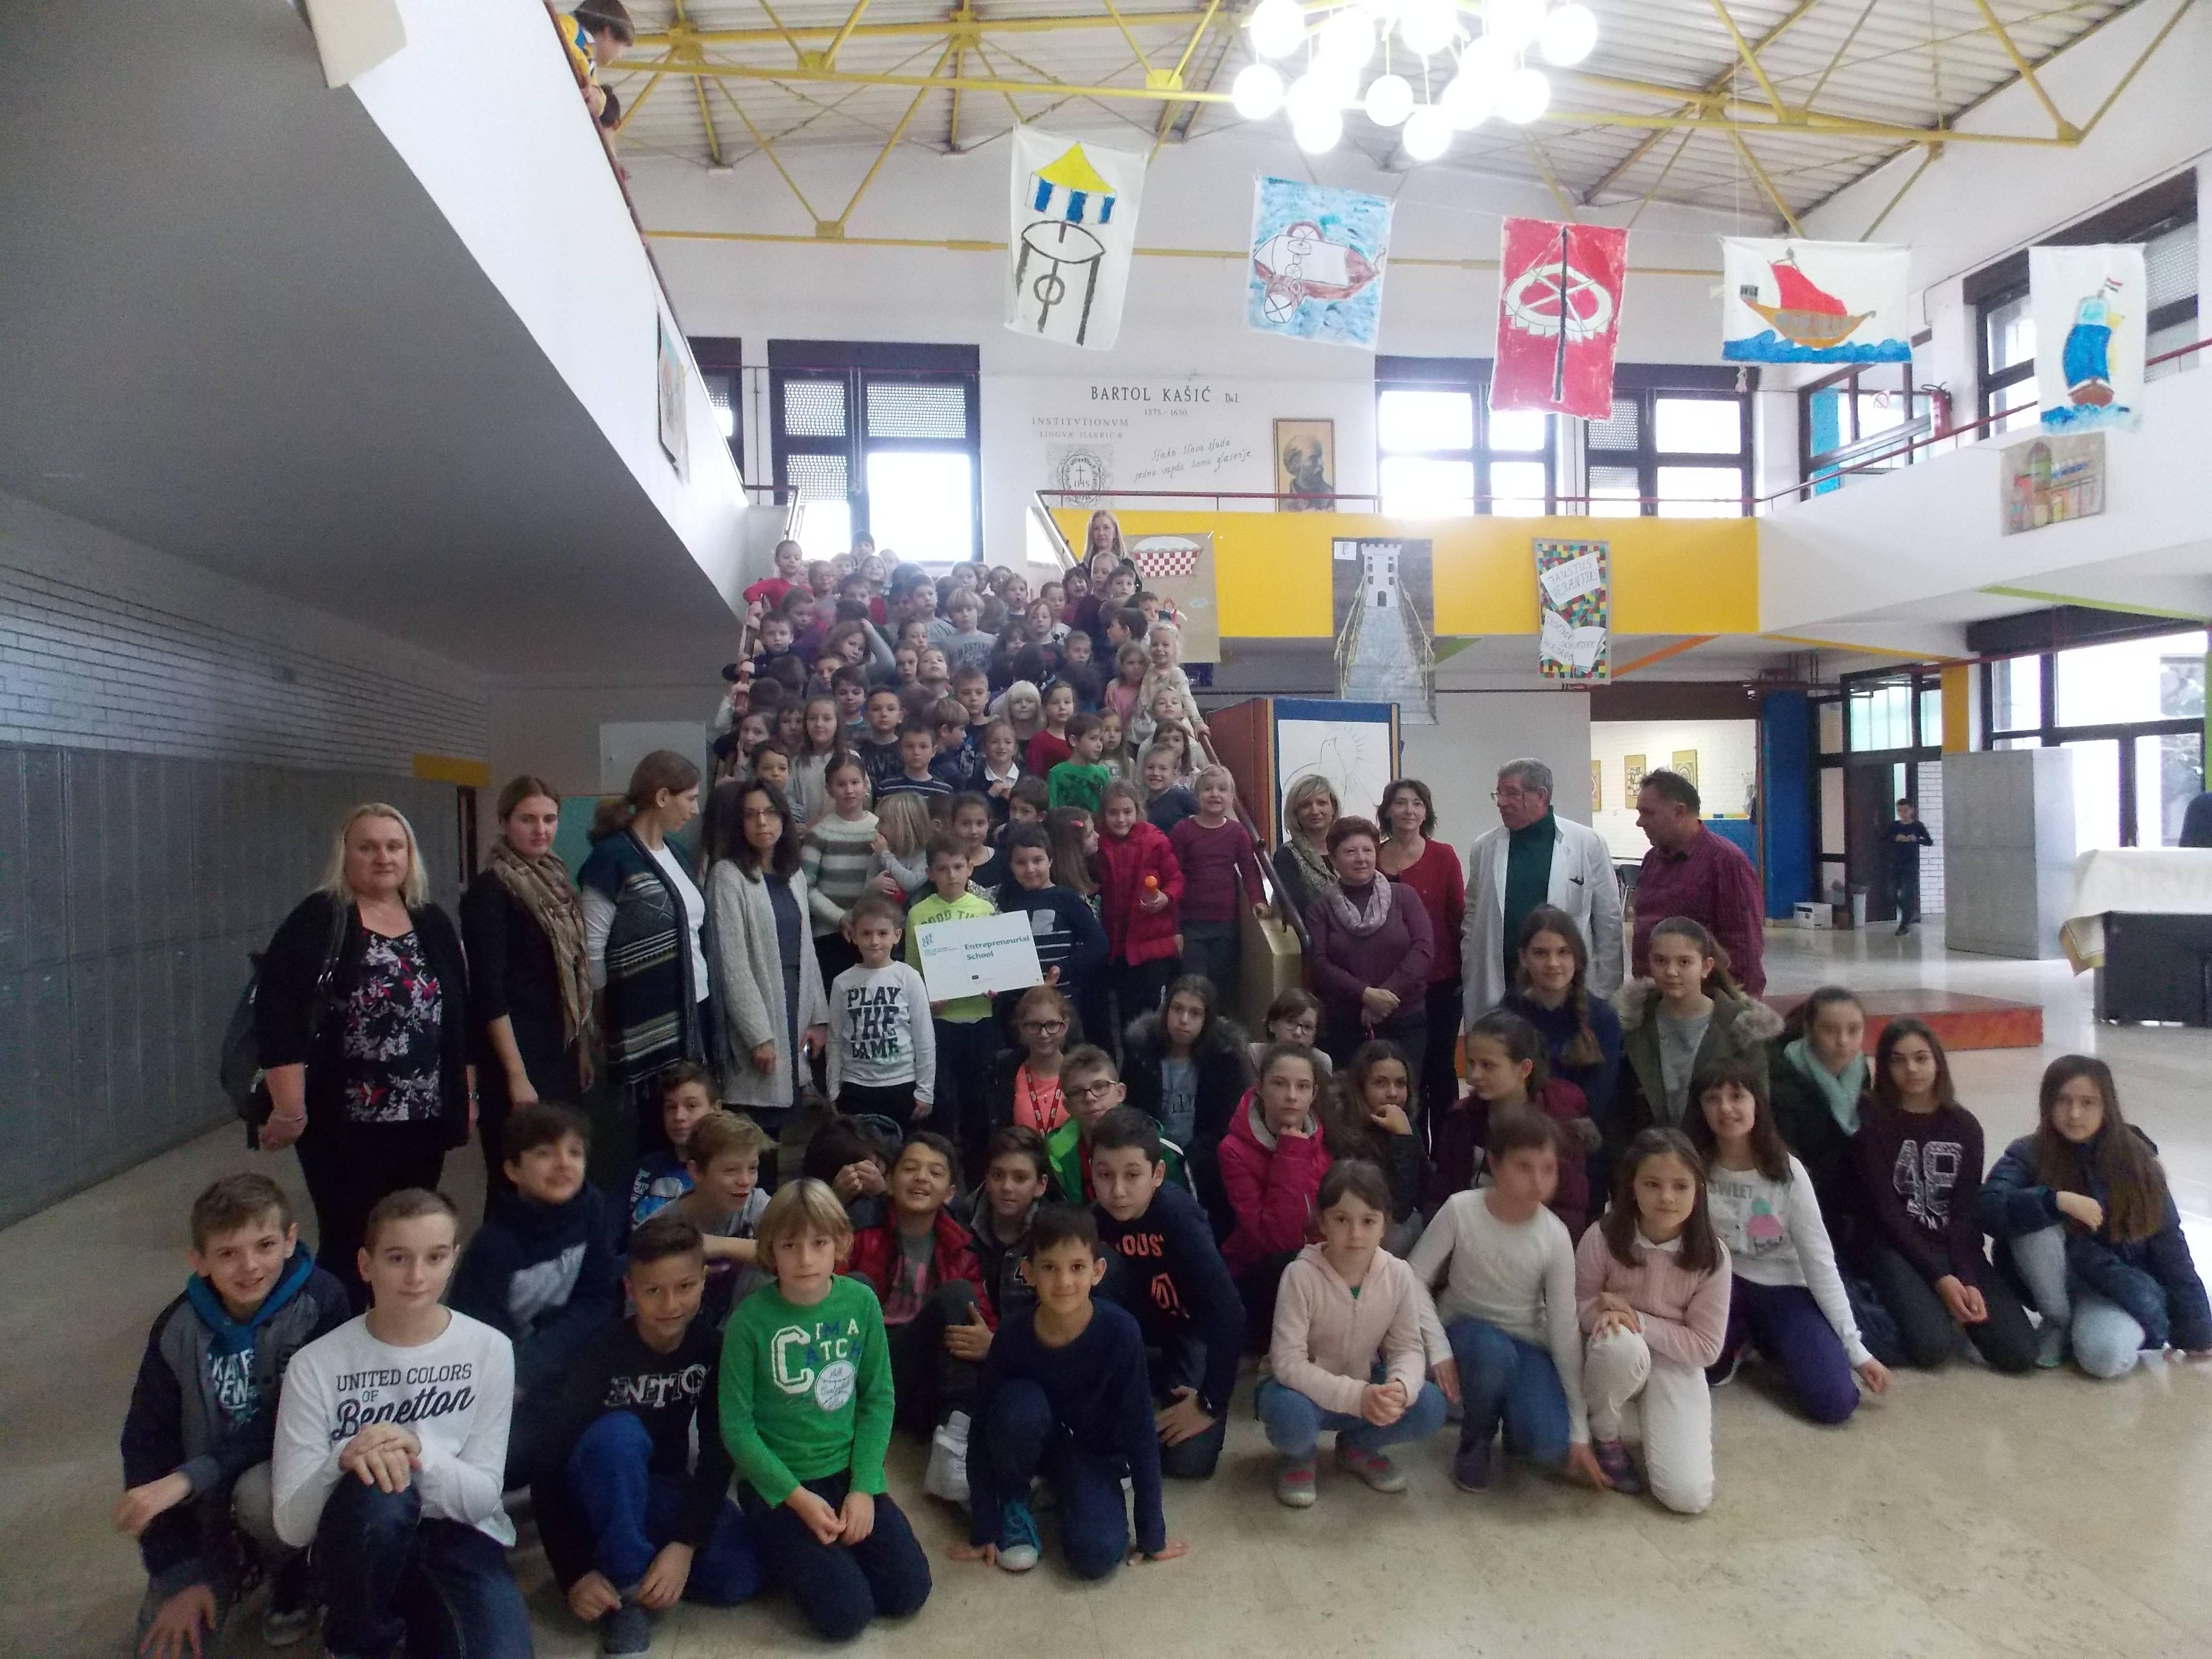 Osnovna Skola Bartola Kasica Zagreb Projekt Seecel